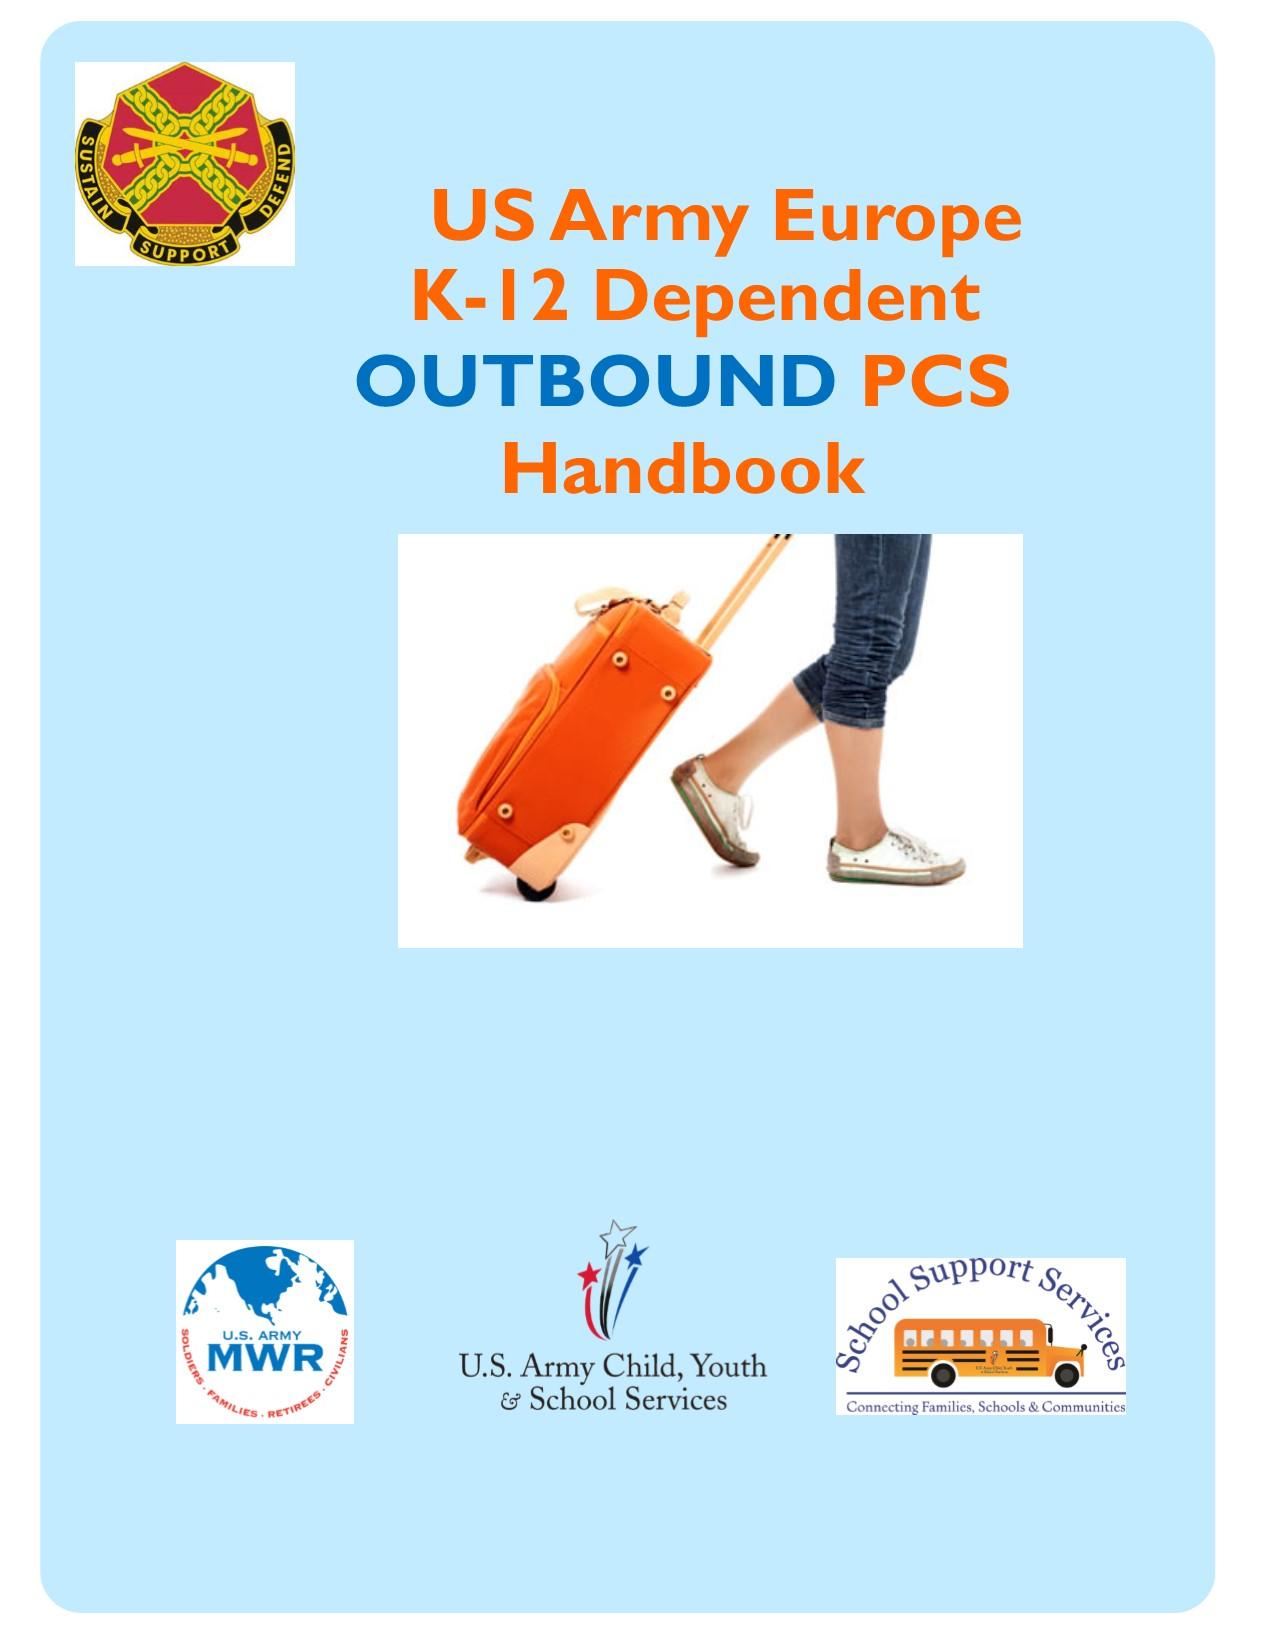 SLO_COVER OUTBOUND PCS Handbook